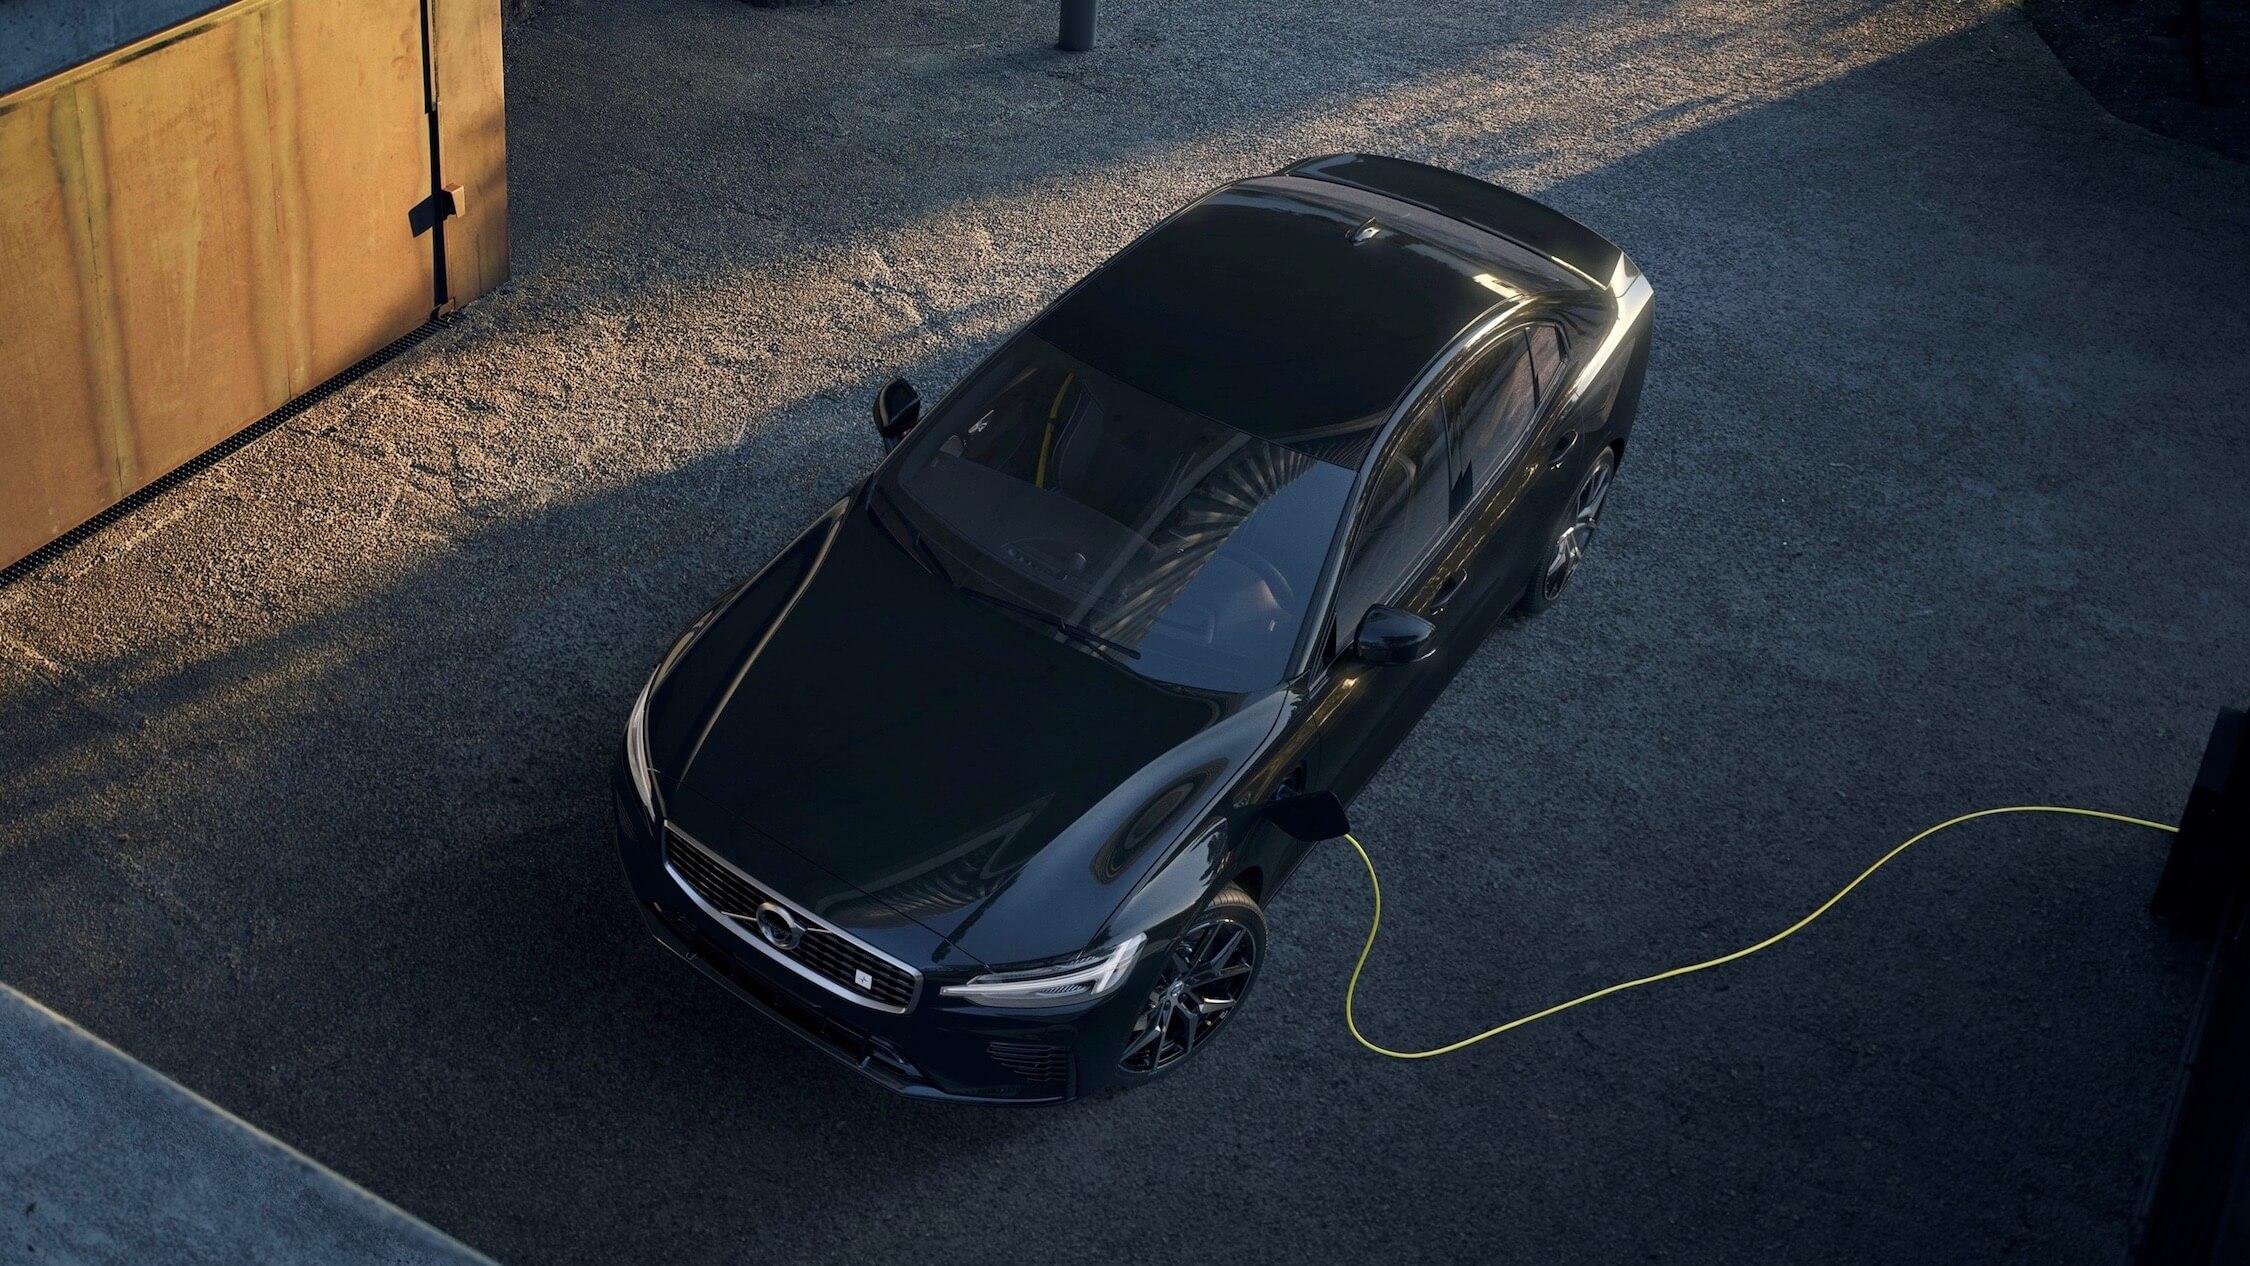 Carregar o Volvo S60 híbrido